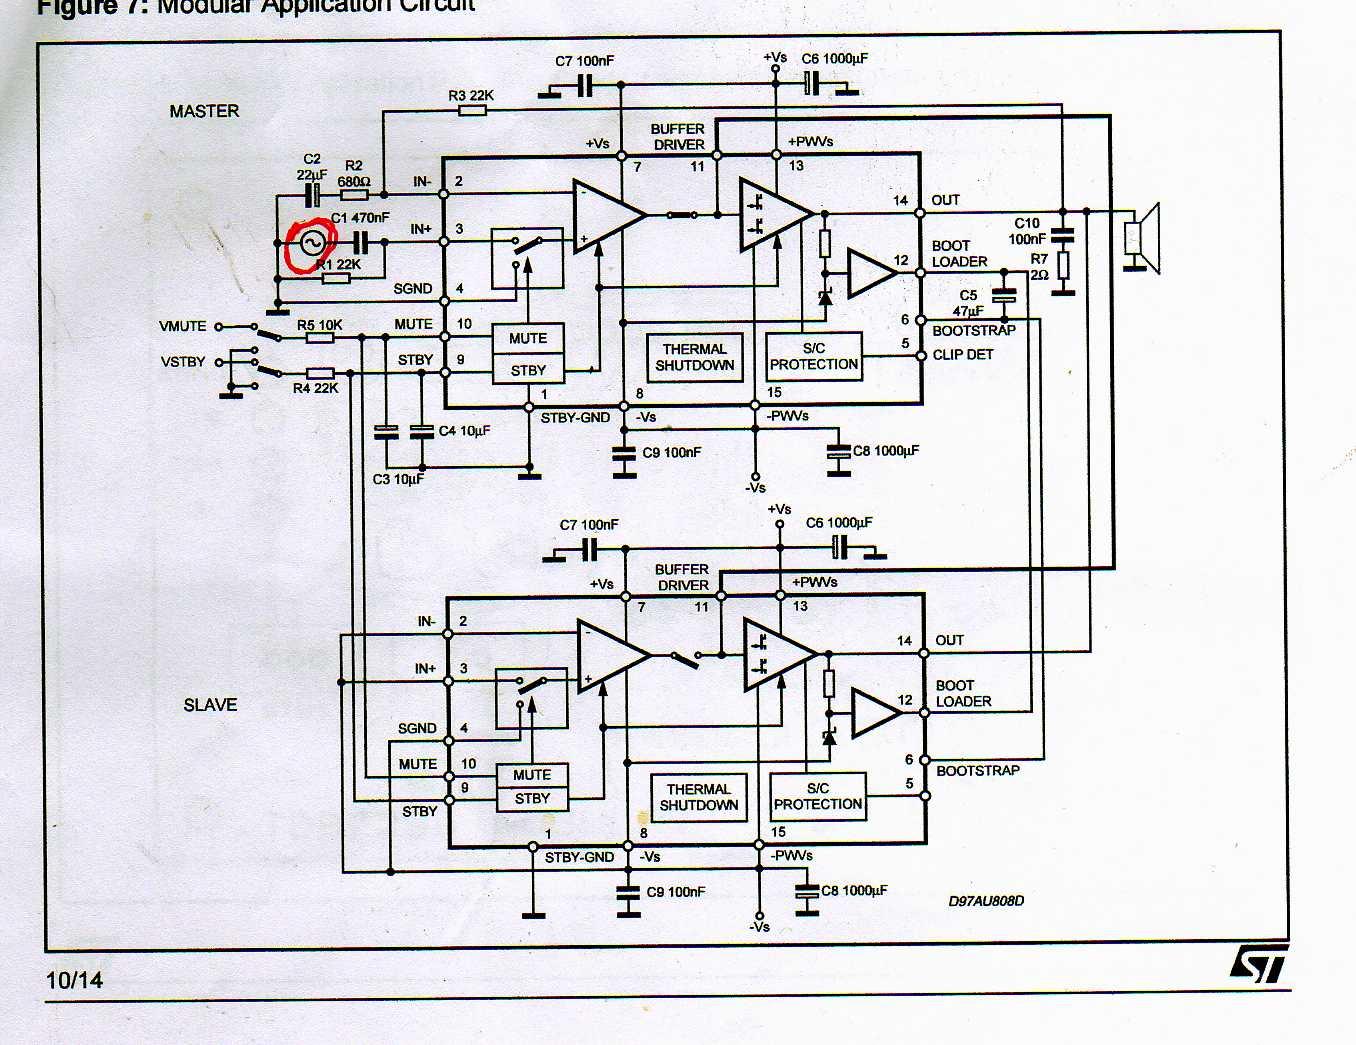 Zeichnungserklärung TDA7293 - Self-made ... - DMXControl-Projects e.V.